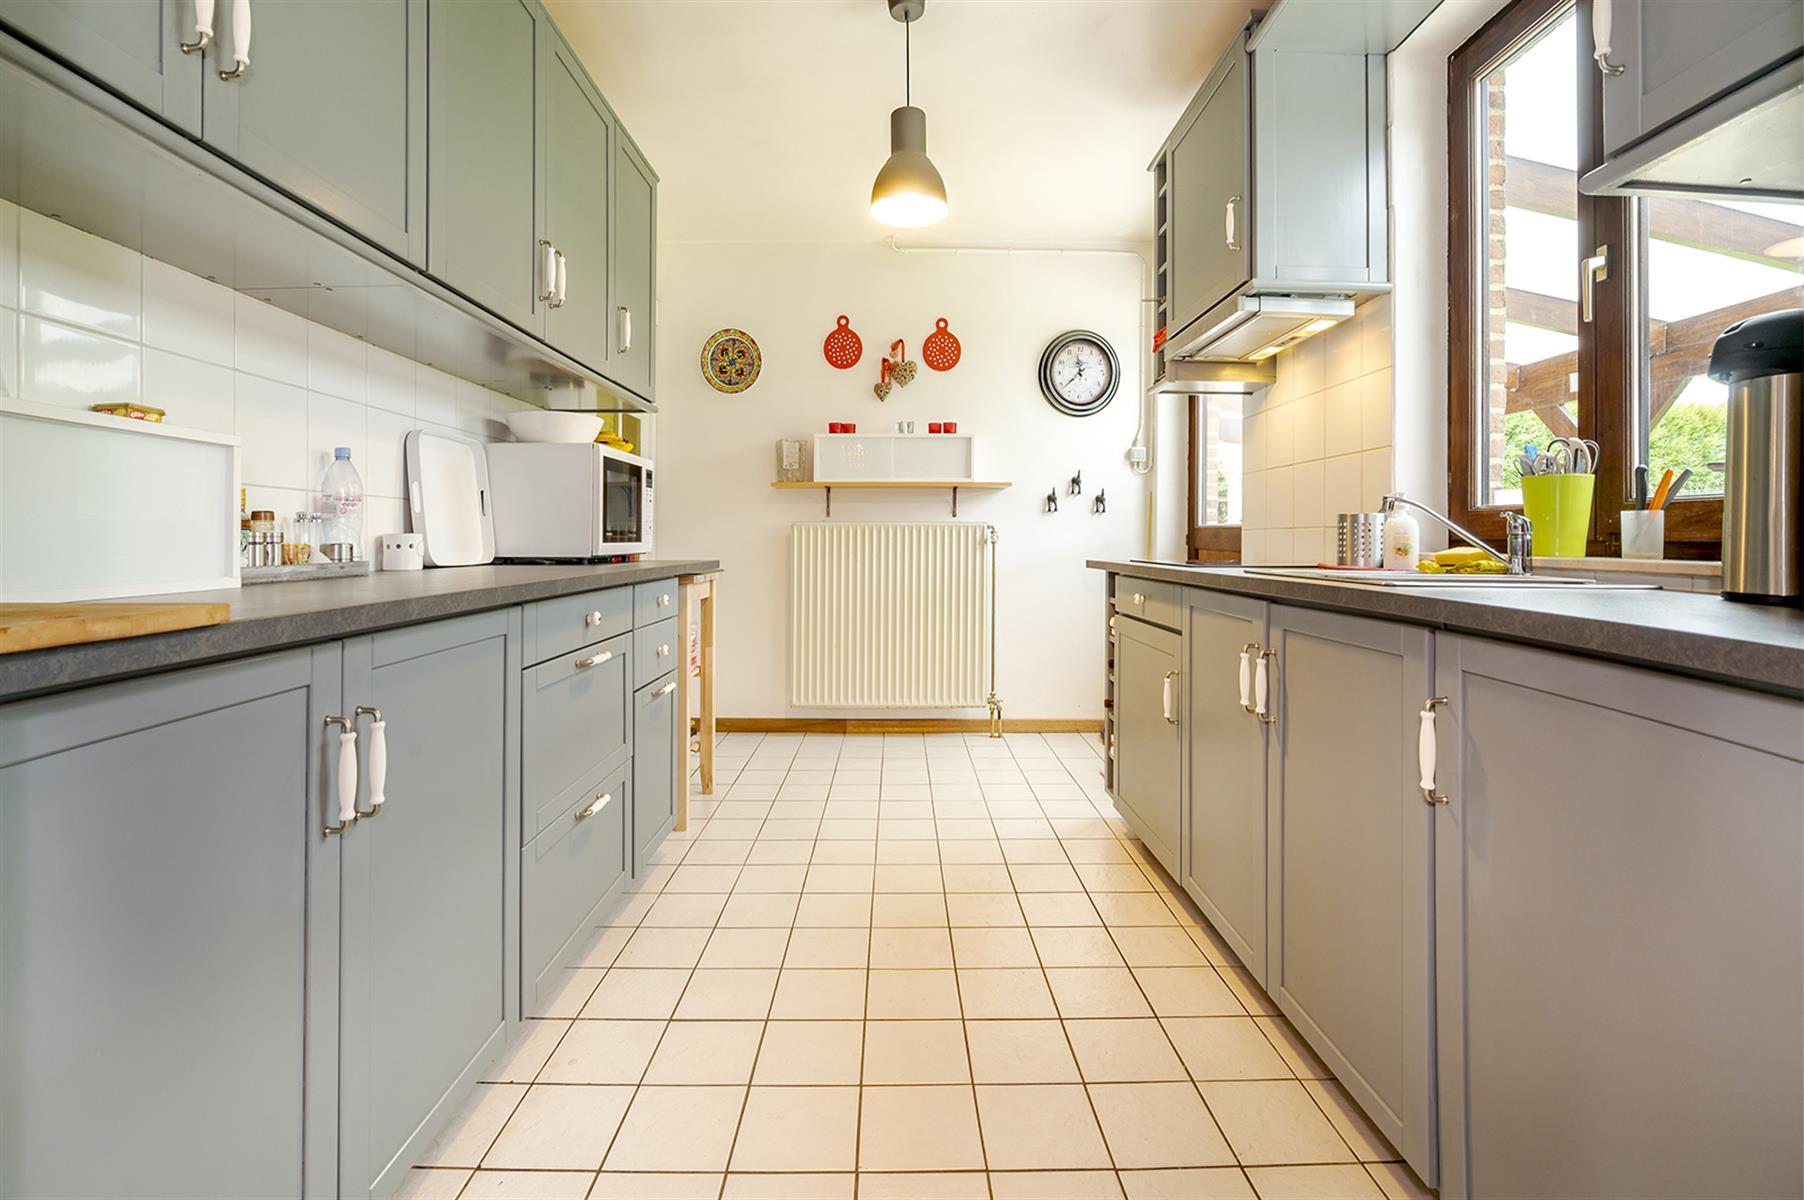 Maison - Jodoigne - #4085972-16